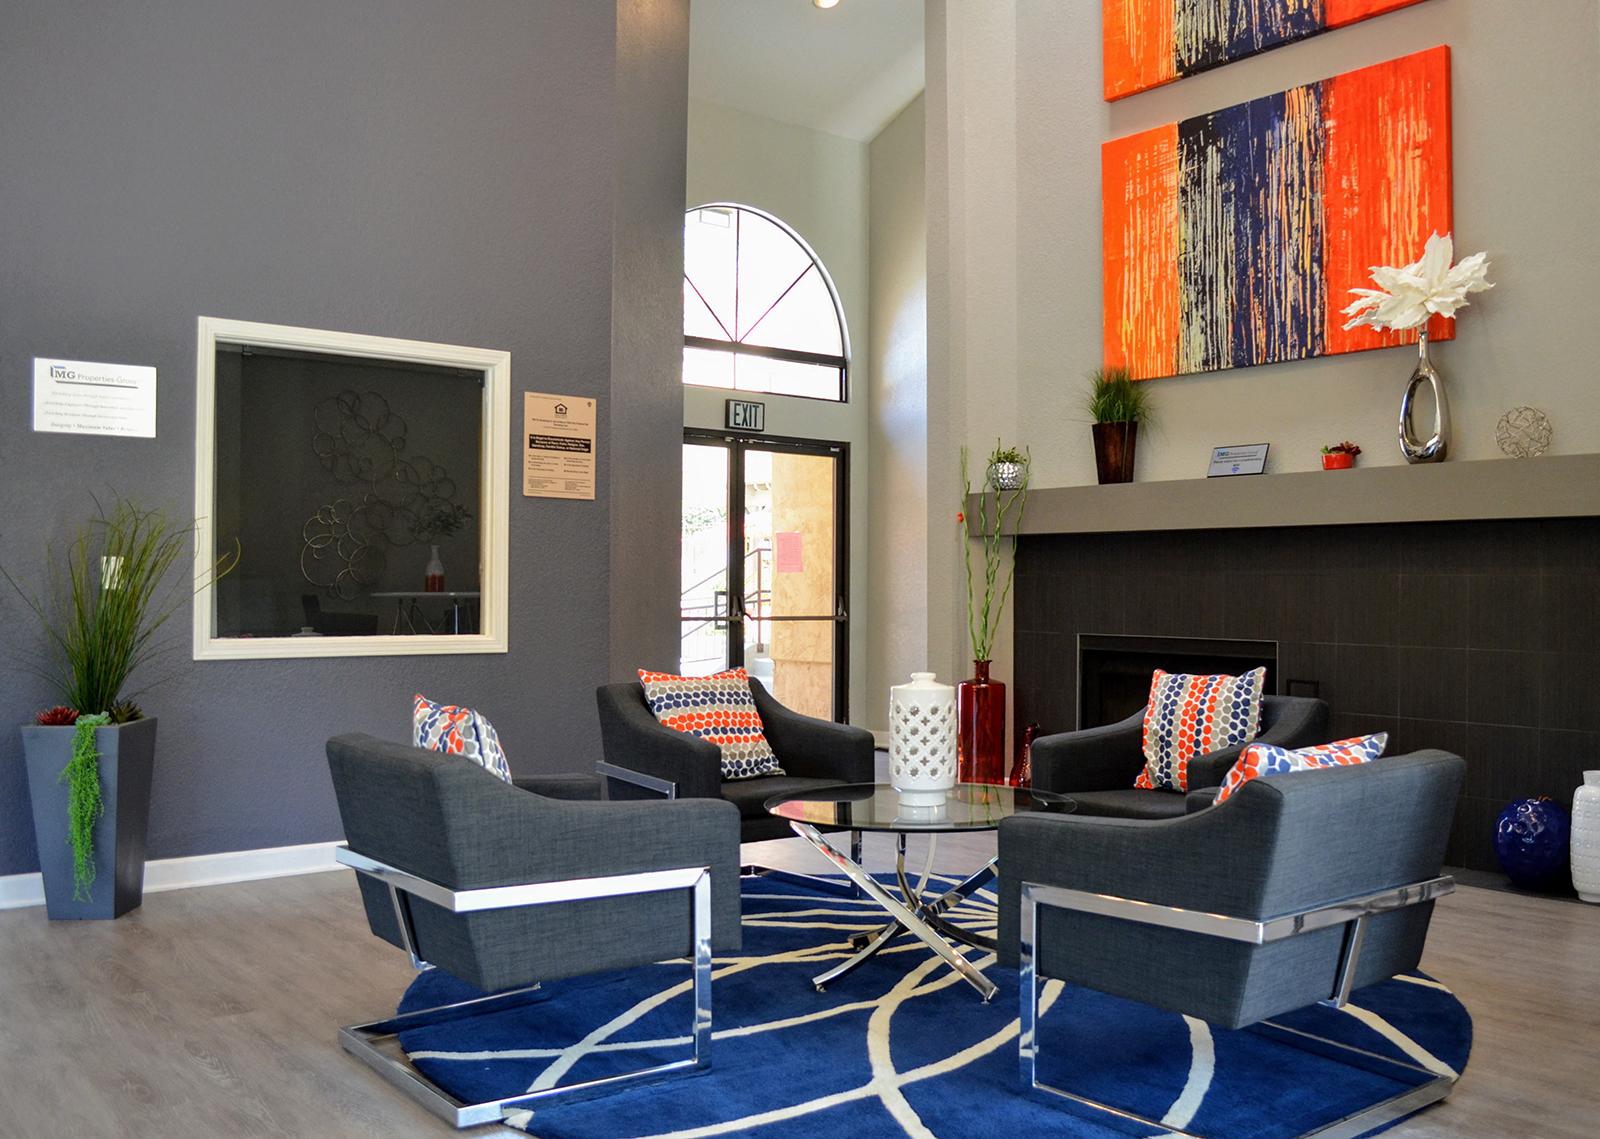 Indoor Relaxation Area at Canyon Villa Apartments, Chula Vista, 91910